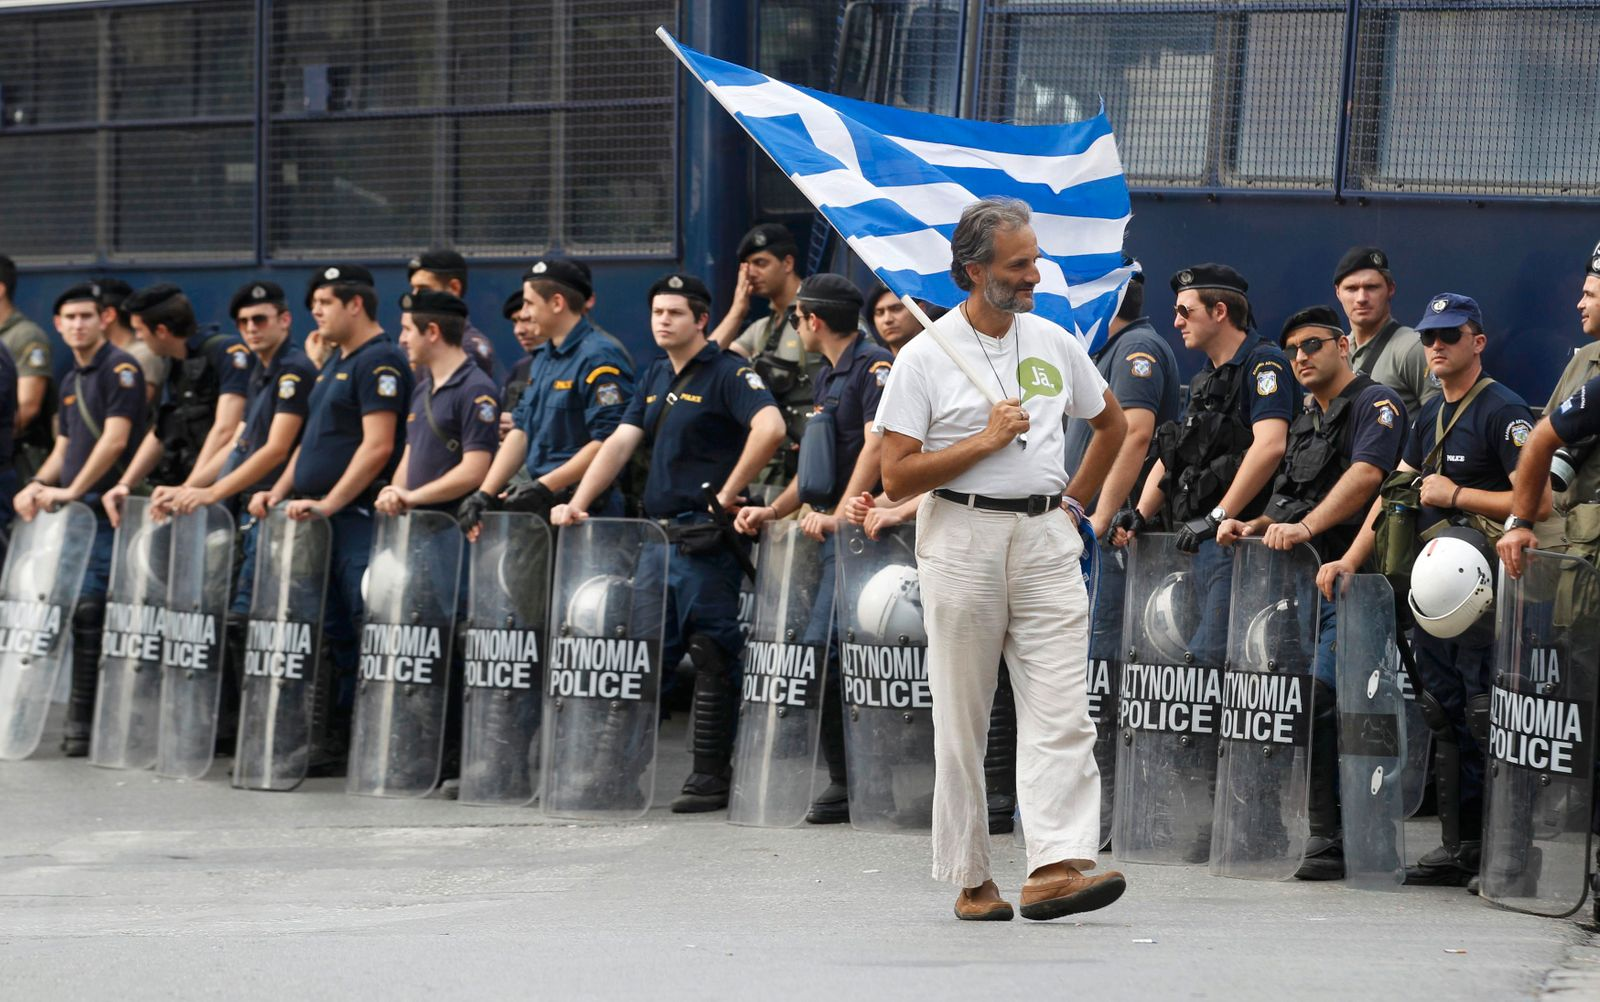 Demonstrant / Demontration / Griechenland / griechische Fahne